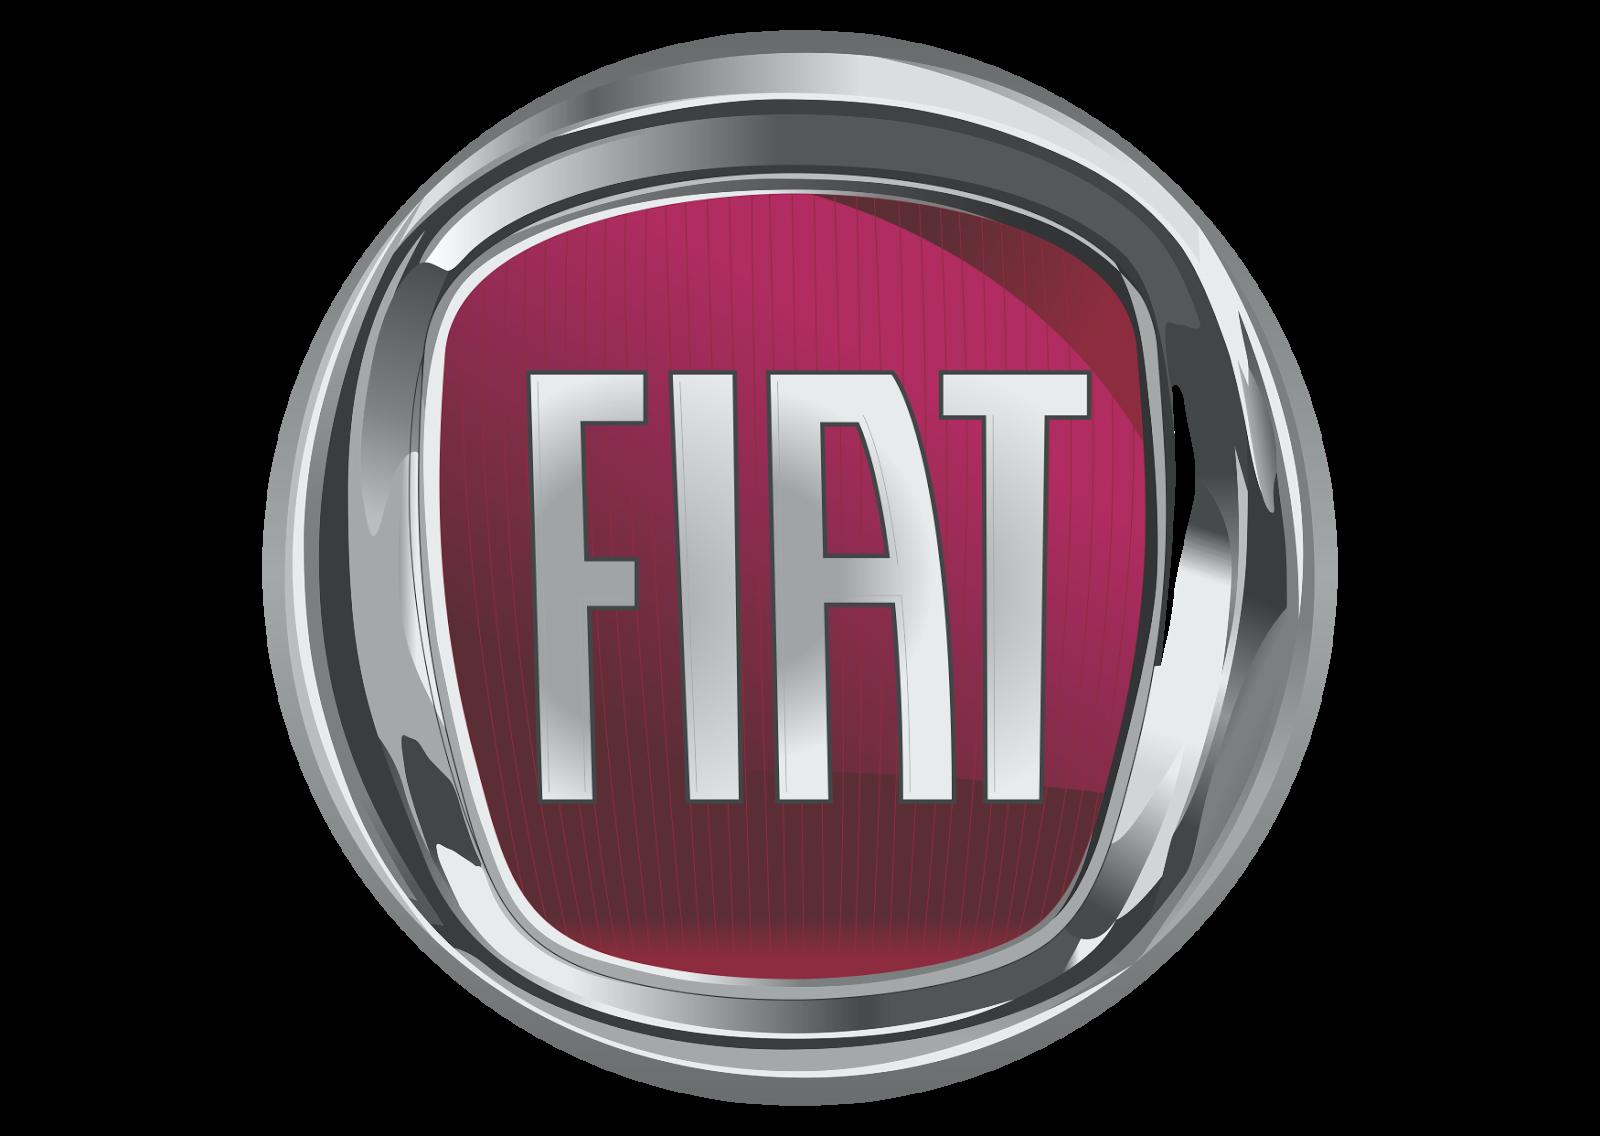 fiat logo vector | vector logo download | pinterest | fiat, logos